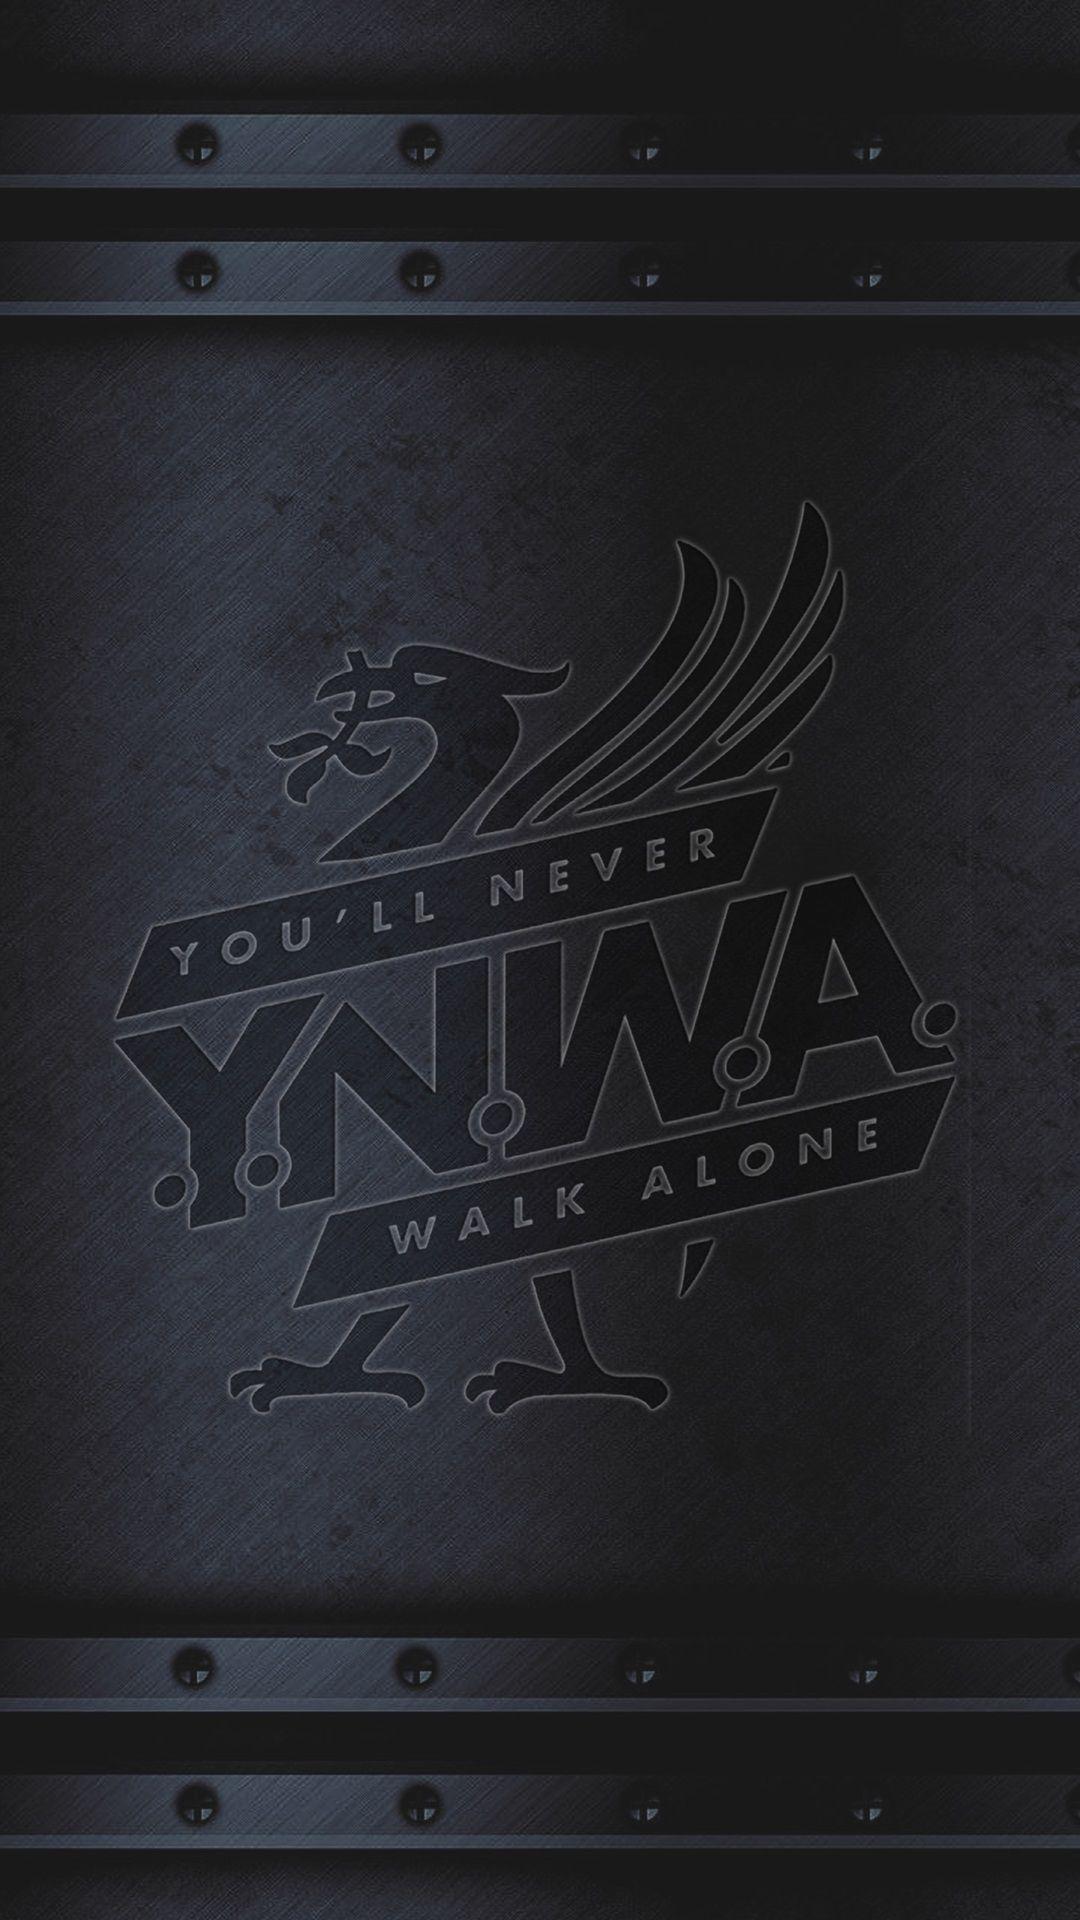 Pin oleh Rich Weida di Liverpool f.c. YNWA Seni